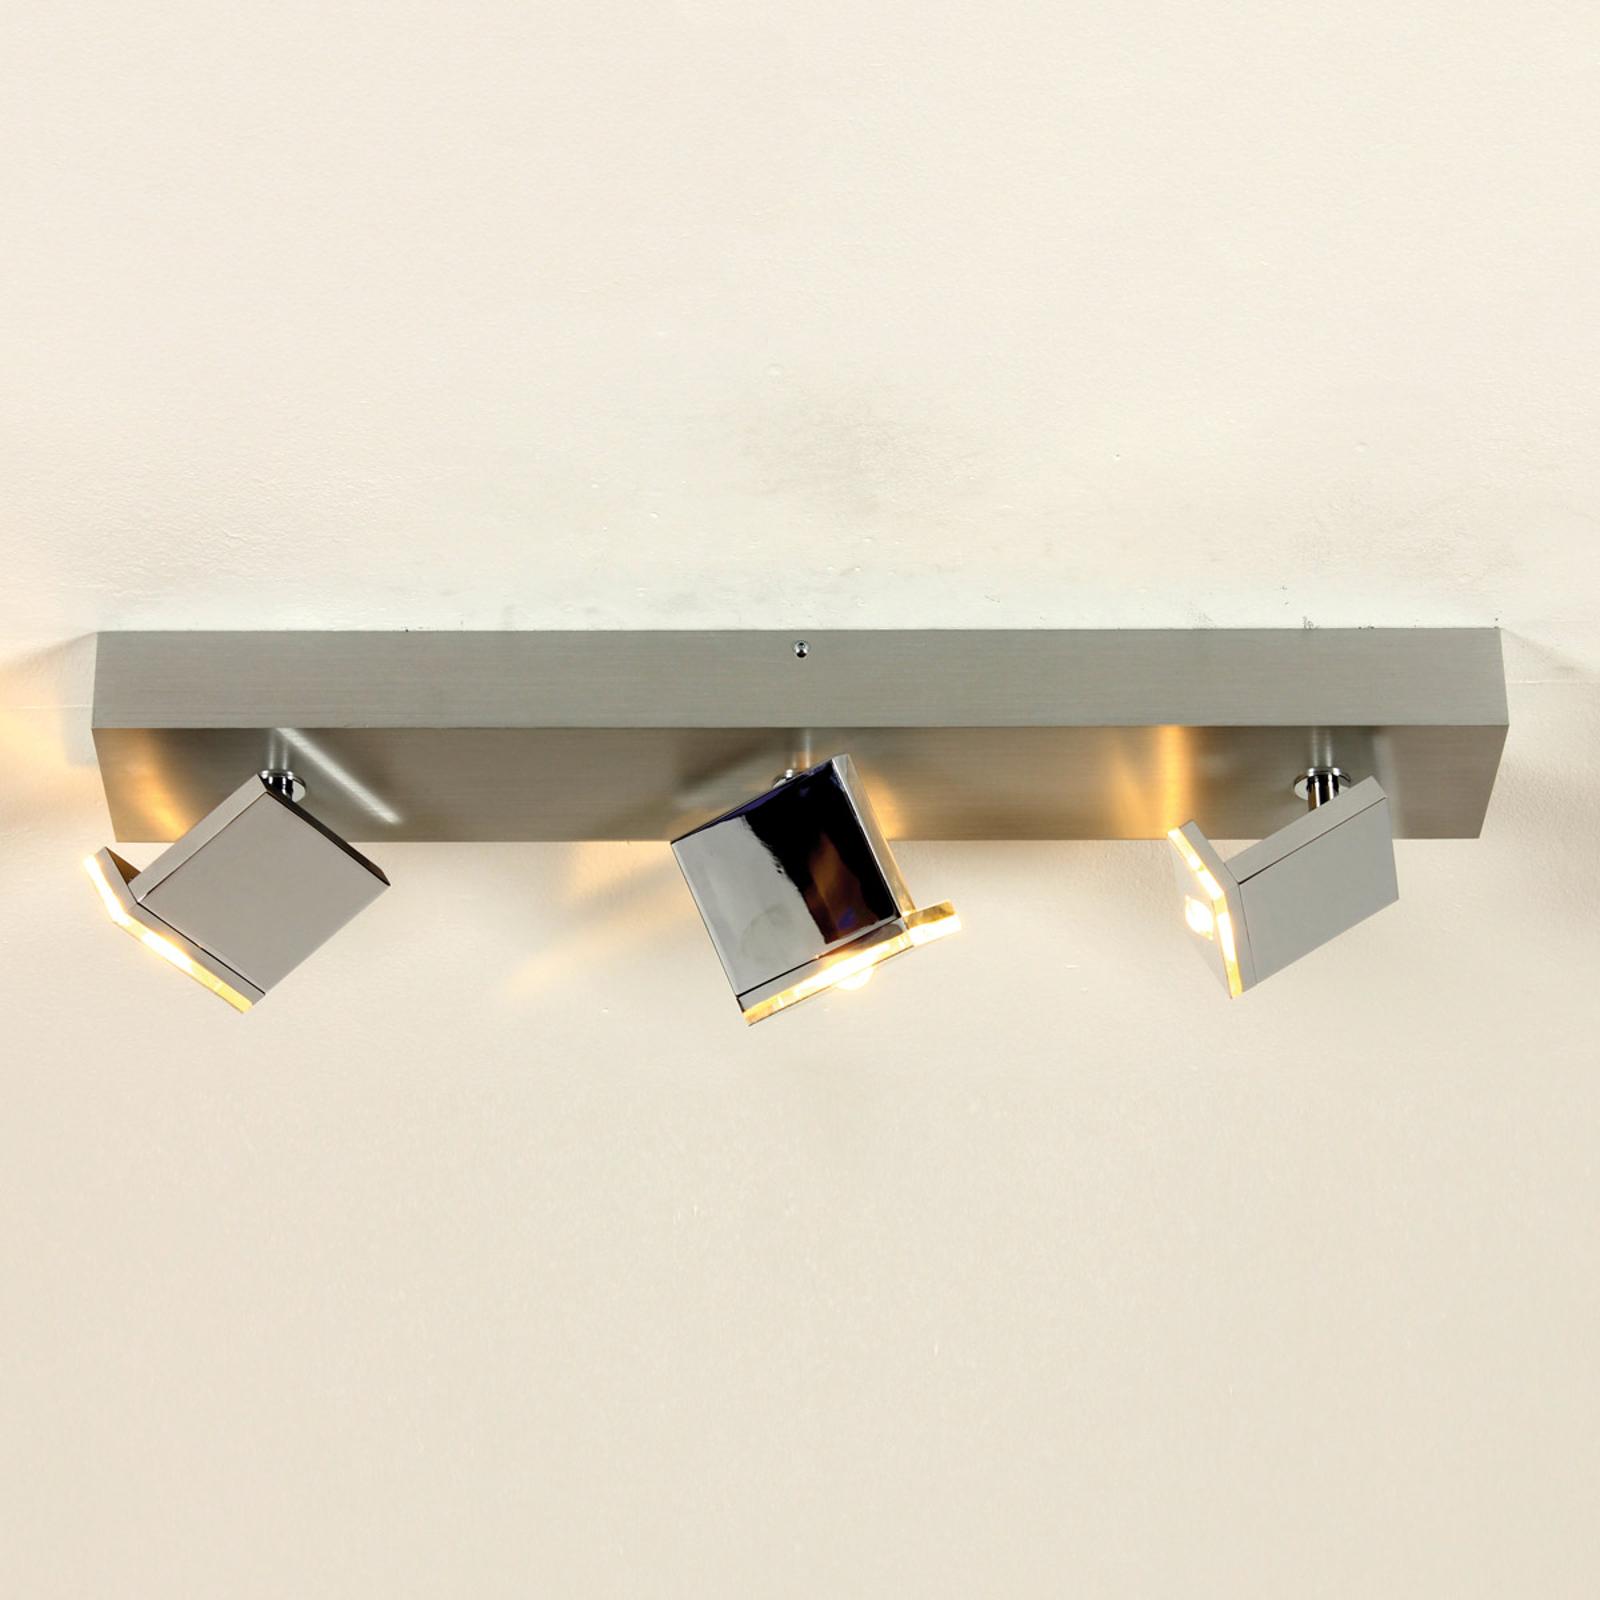 Bopp Elle - dreiflammige LED-Deckenleuchte dimmbar